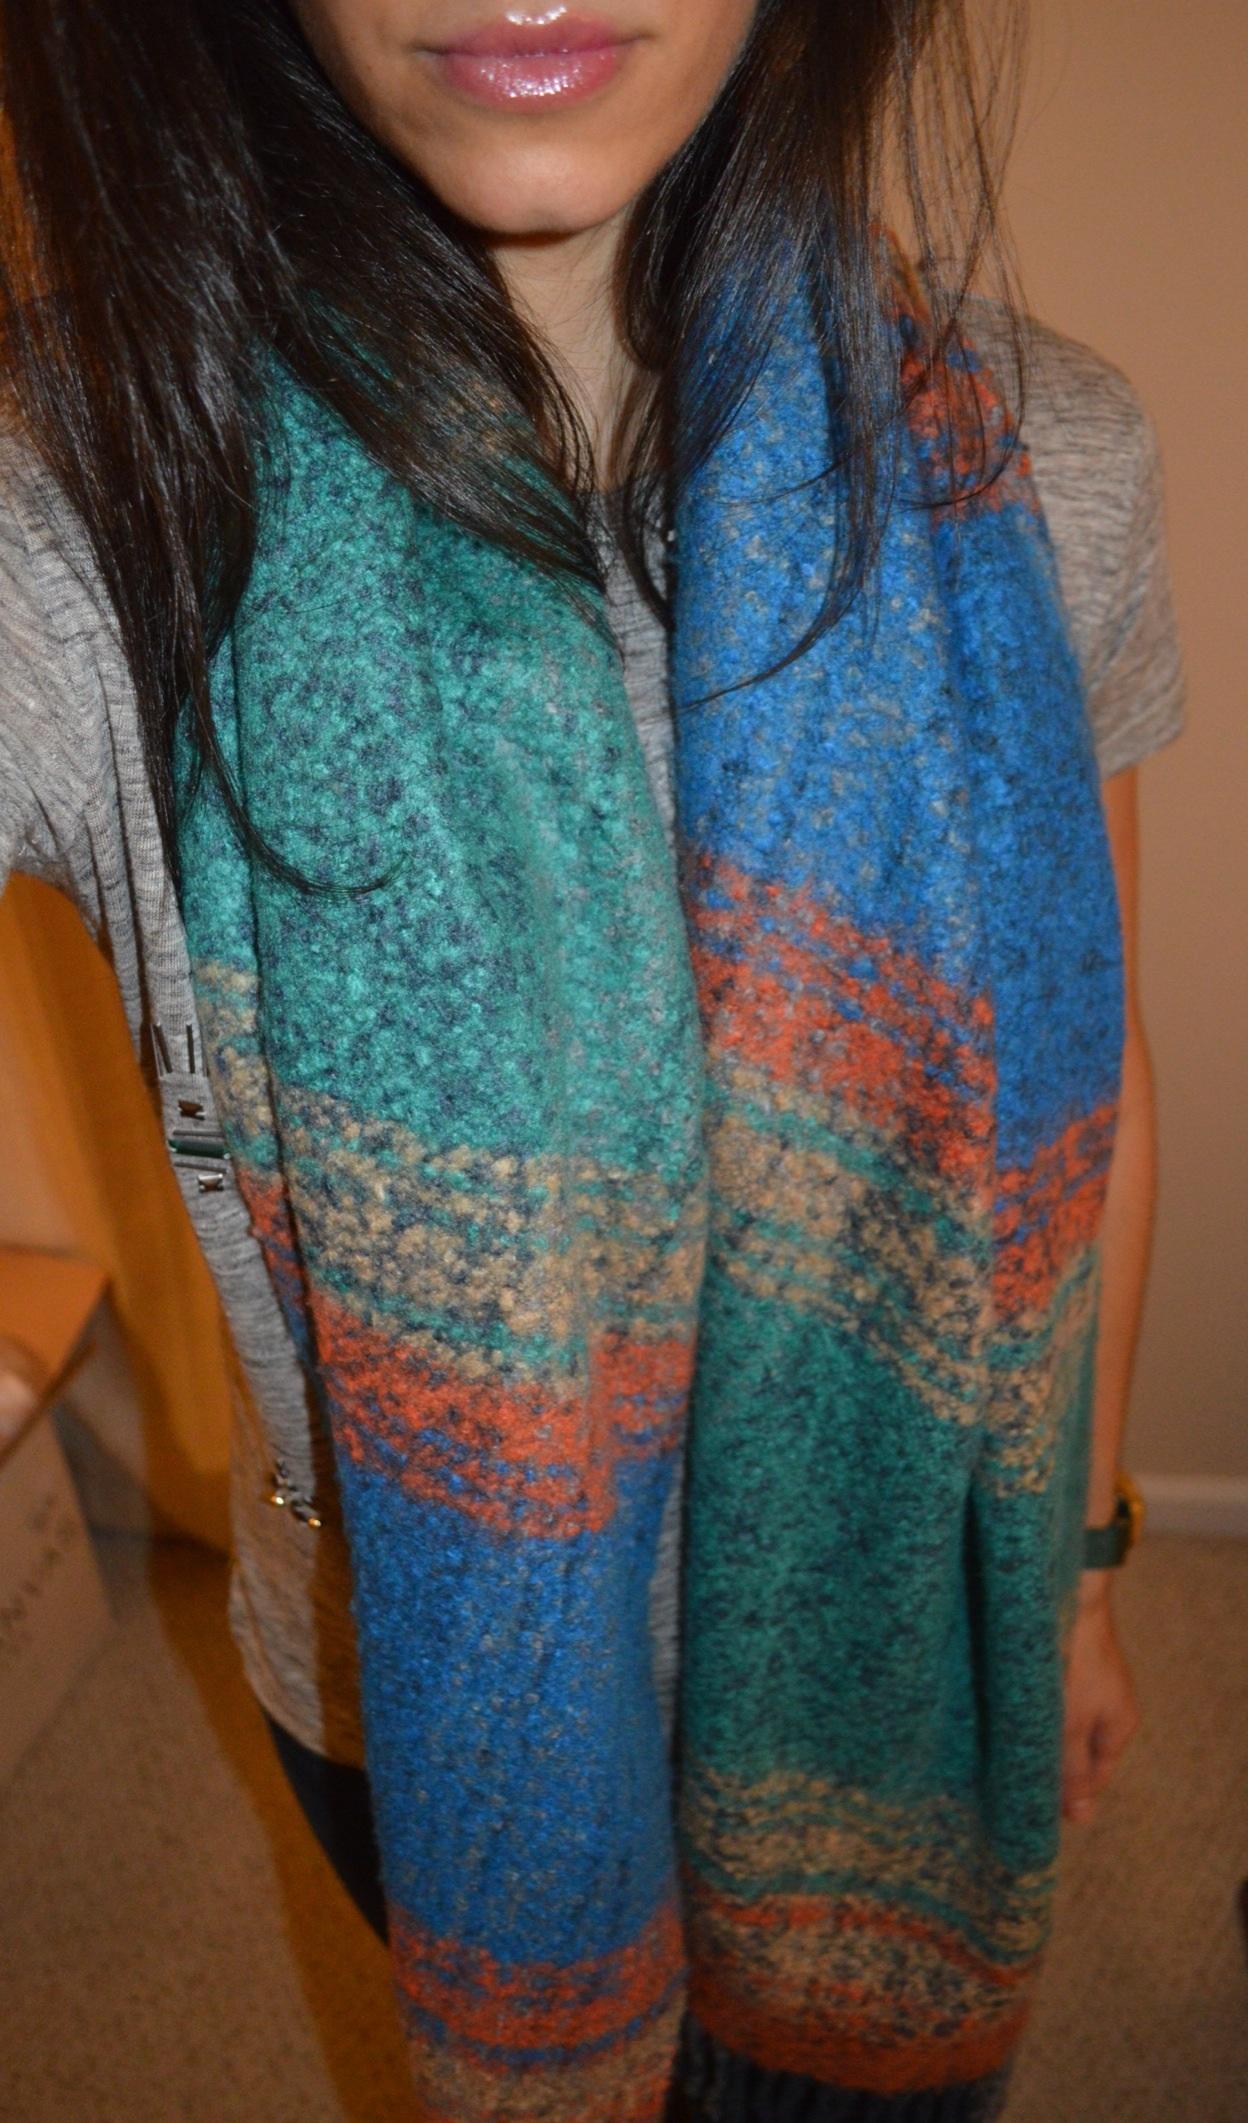 Lauren Schwaiger - Laid Back Style